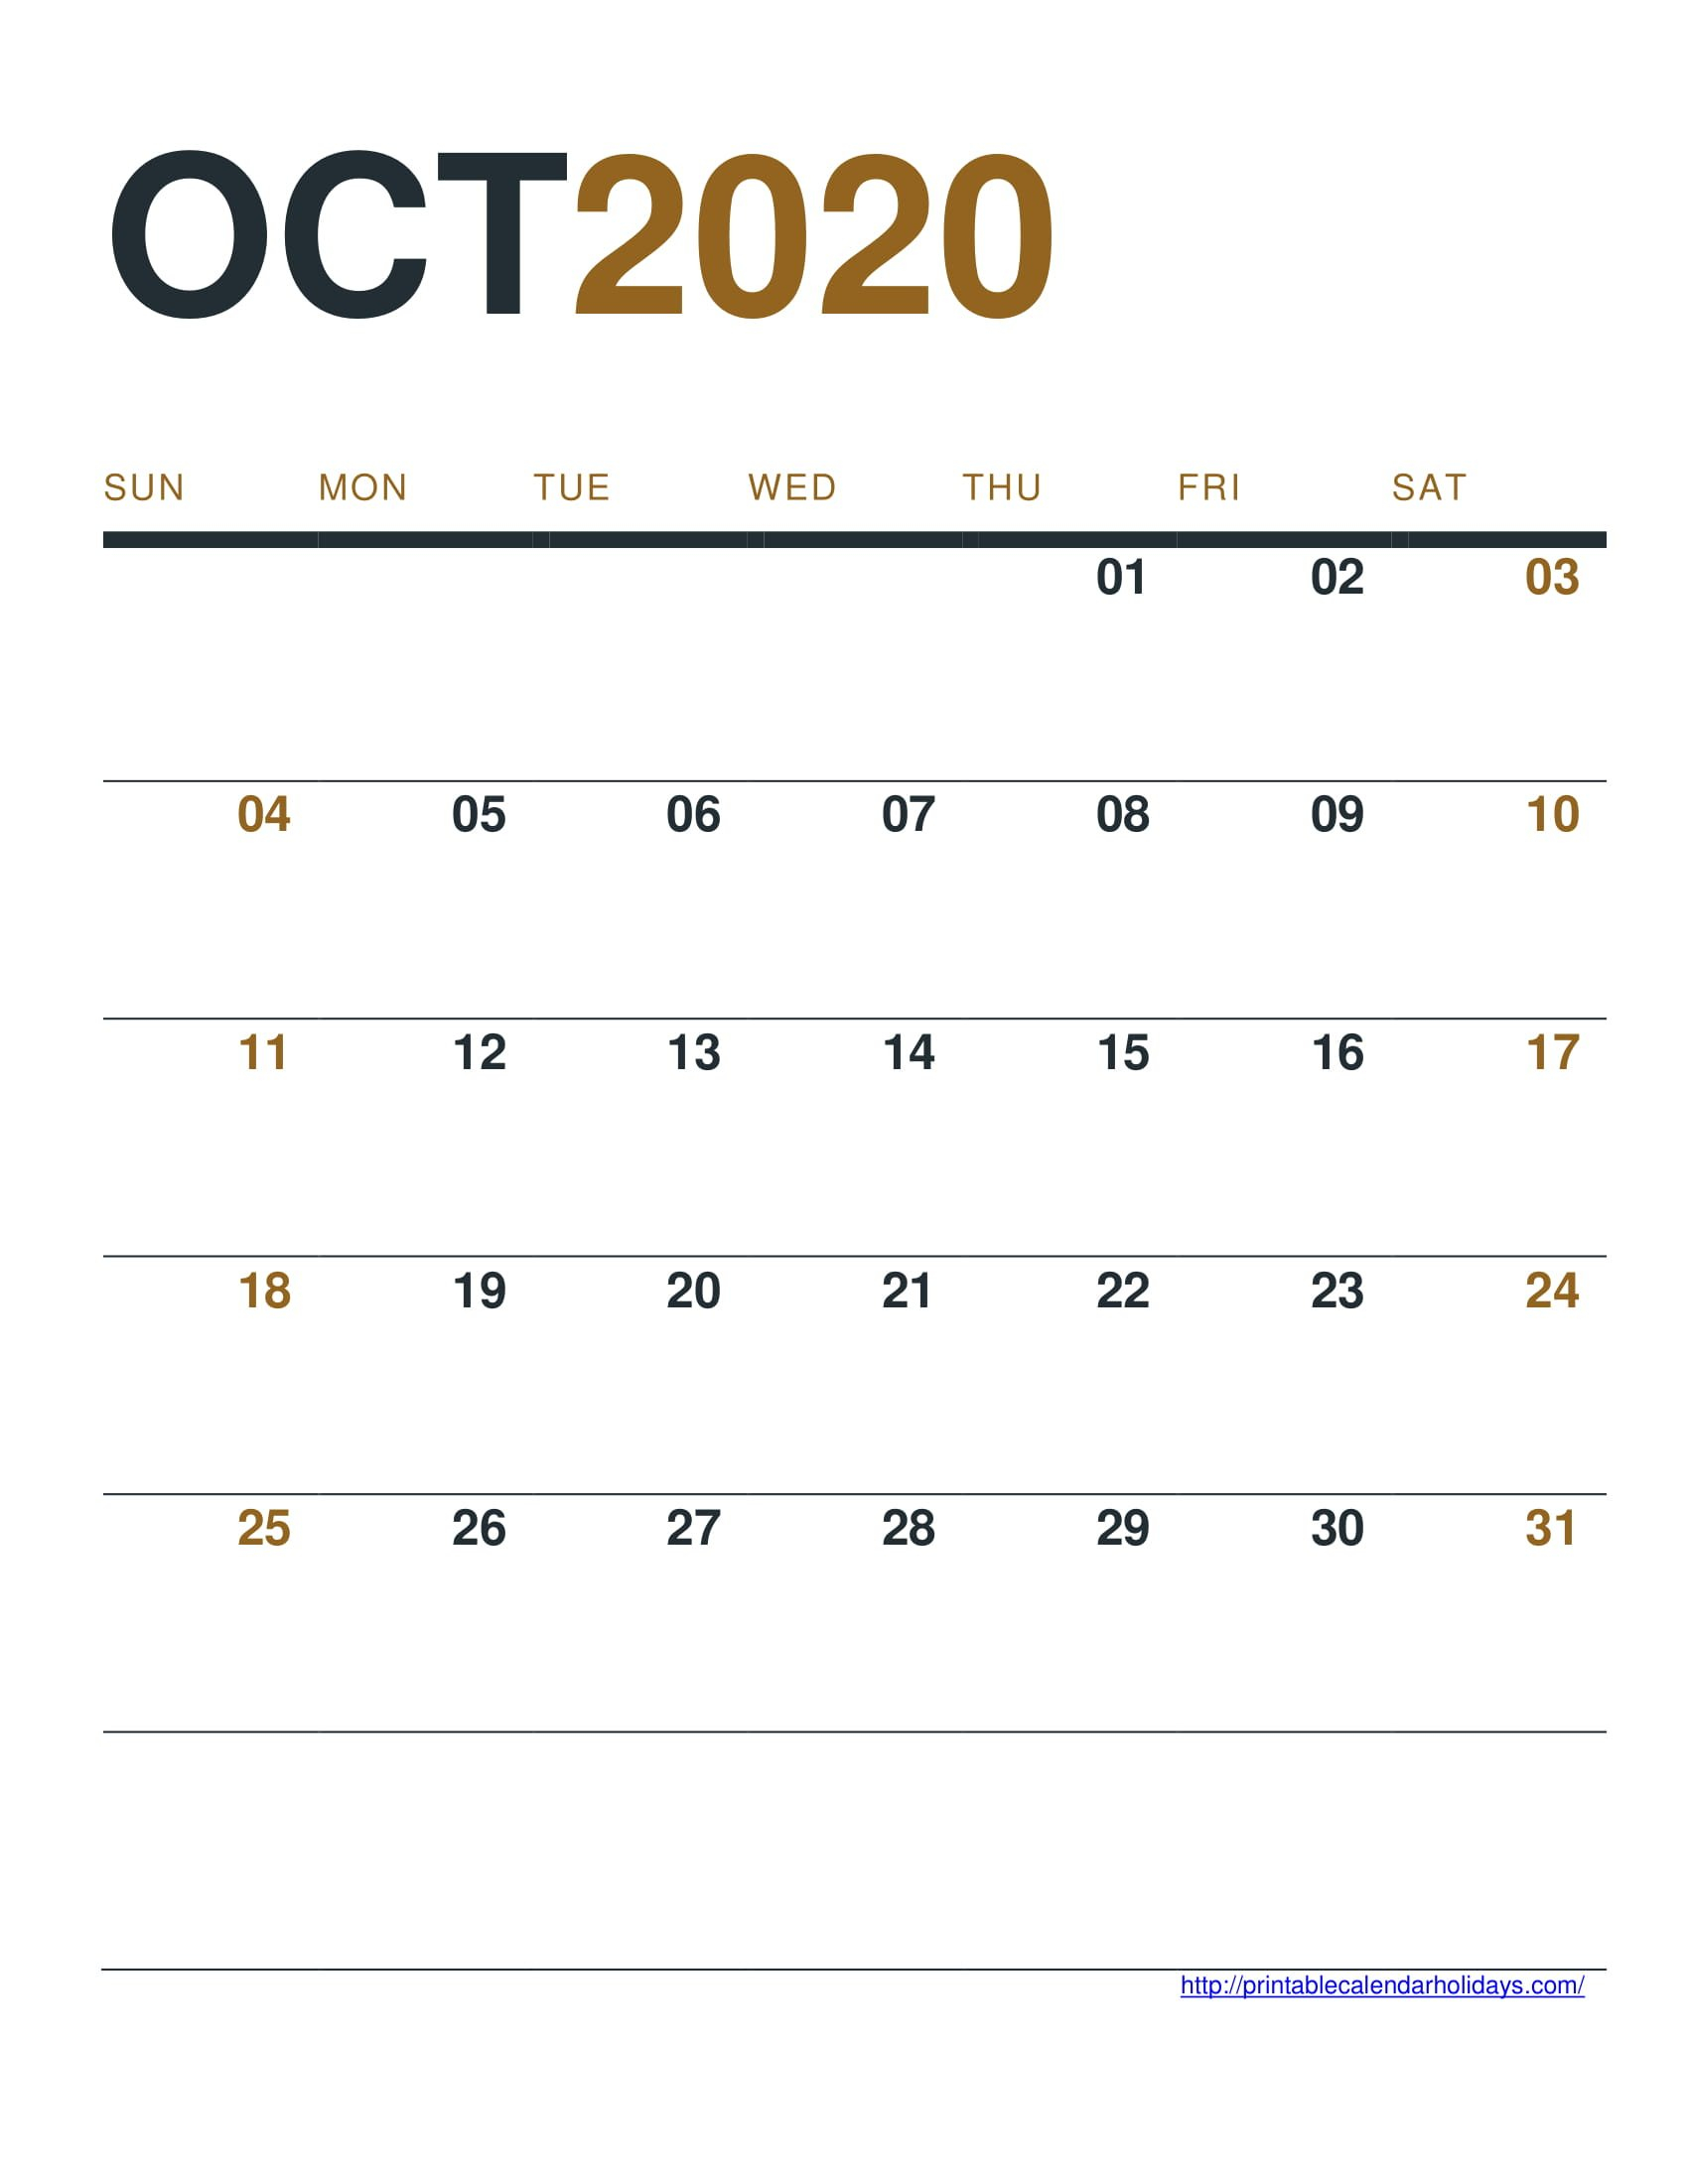 October 2020 Calendar Printable Free – Printable Calendar Free Calendar To Edit And Save